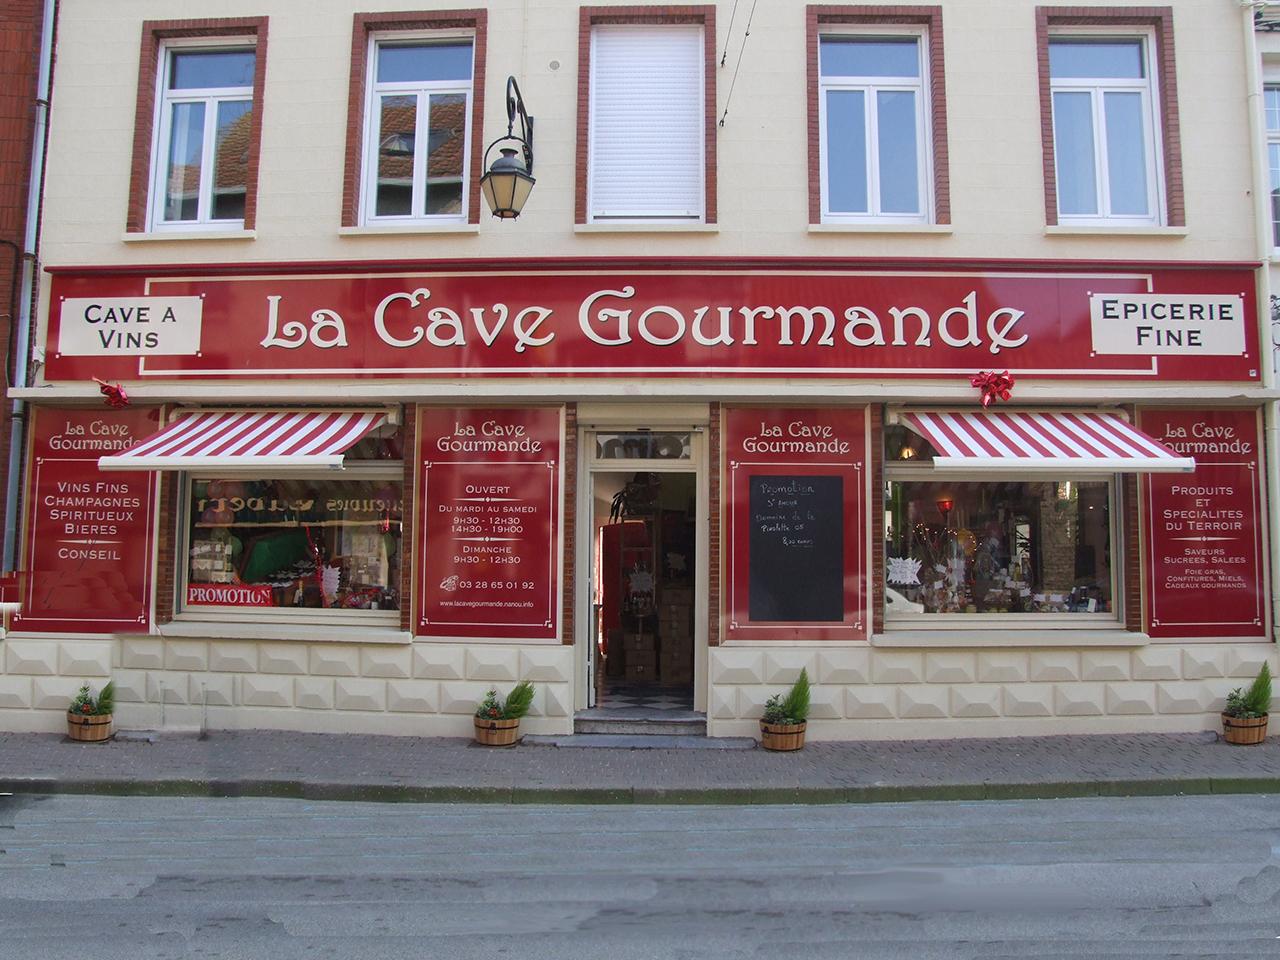 LA CAVE GOURMANDE